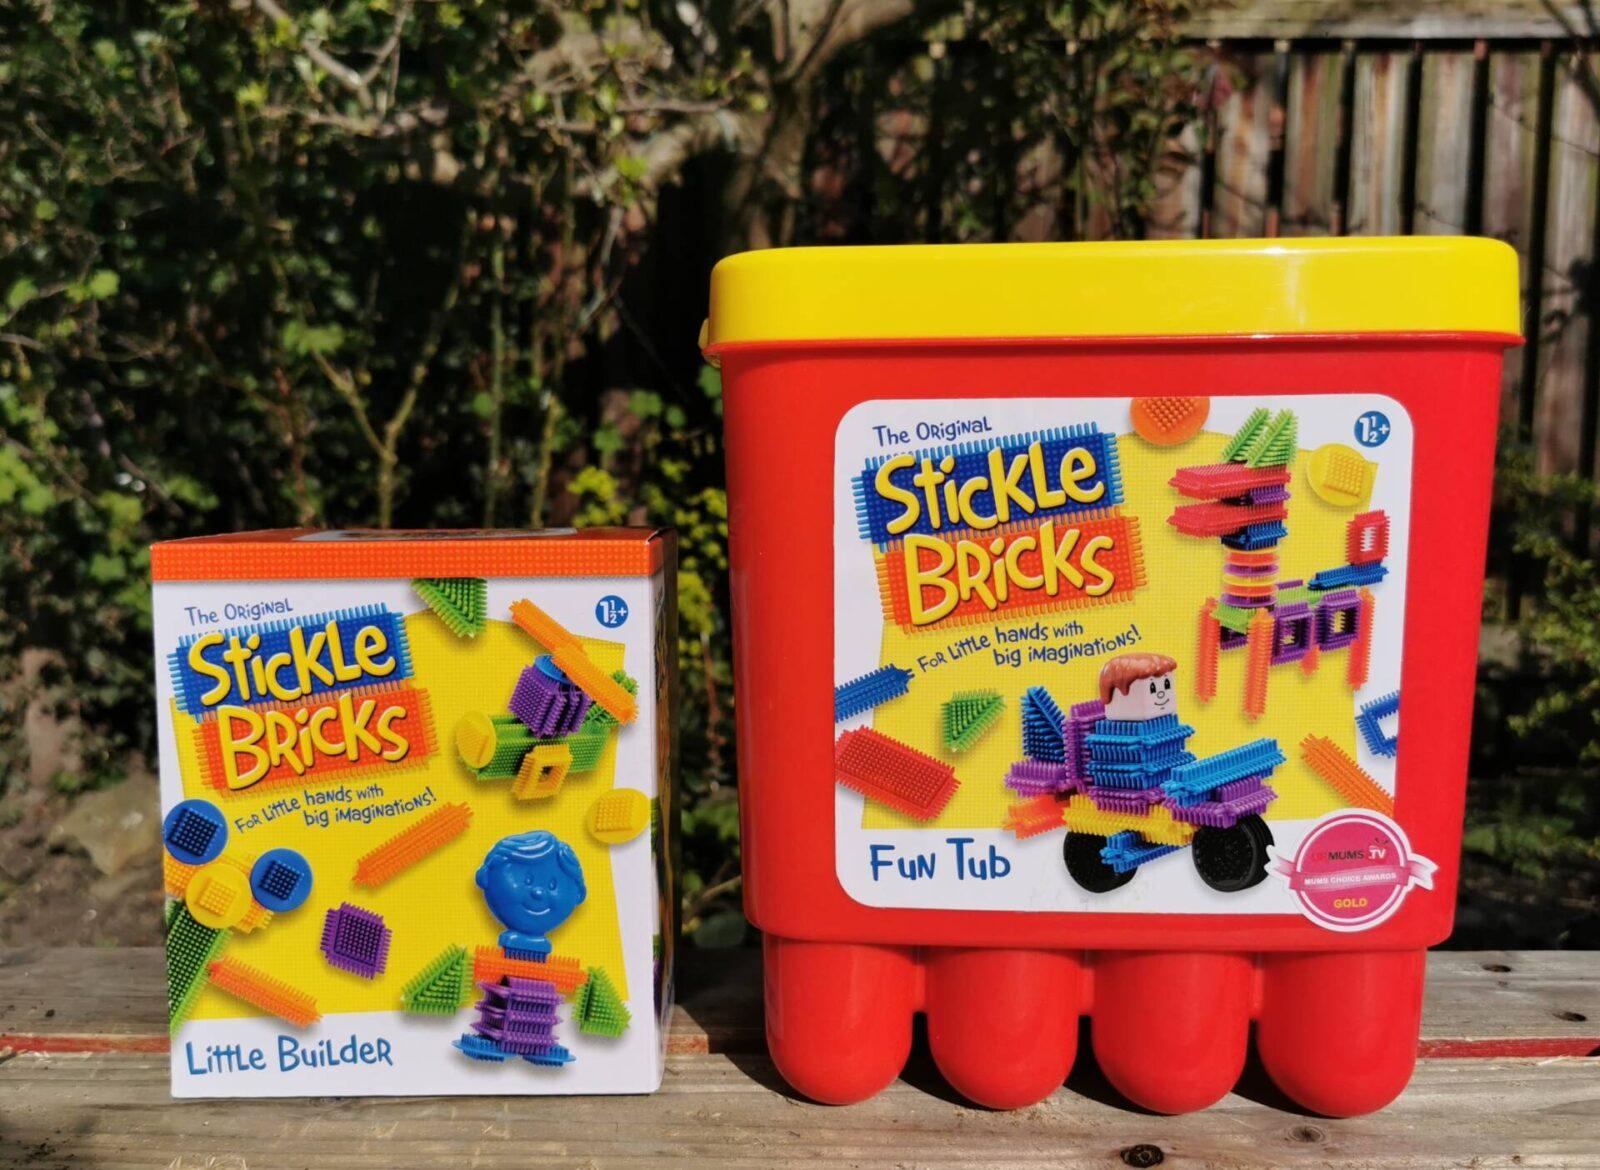 Classic Toys – Stickle Bricks and Plasticine review